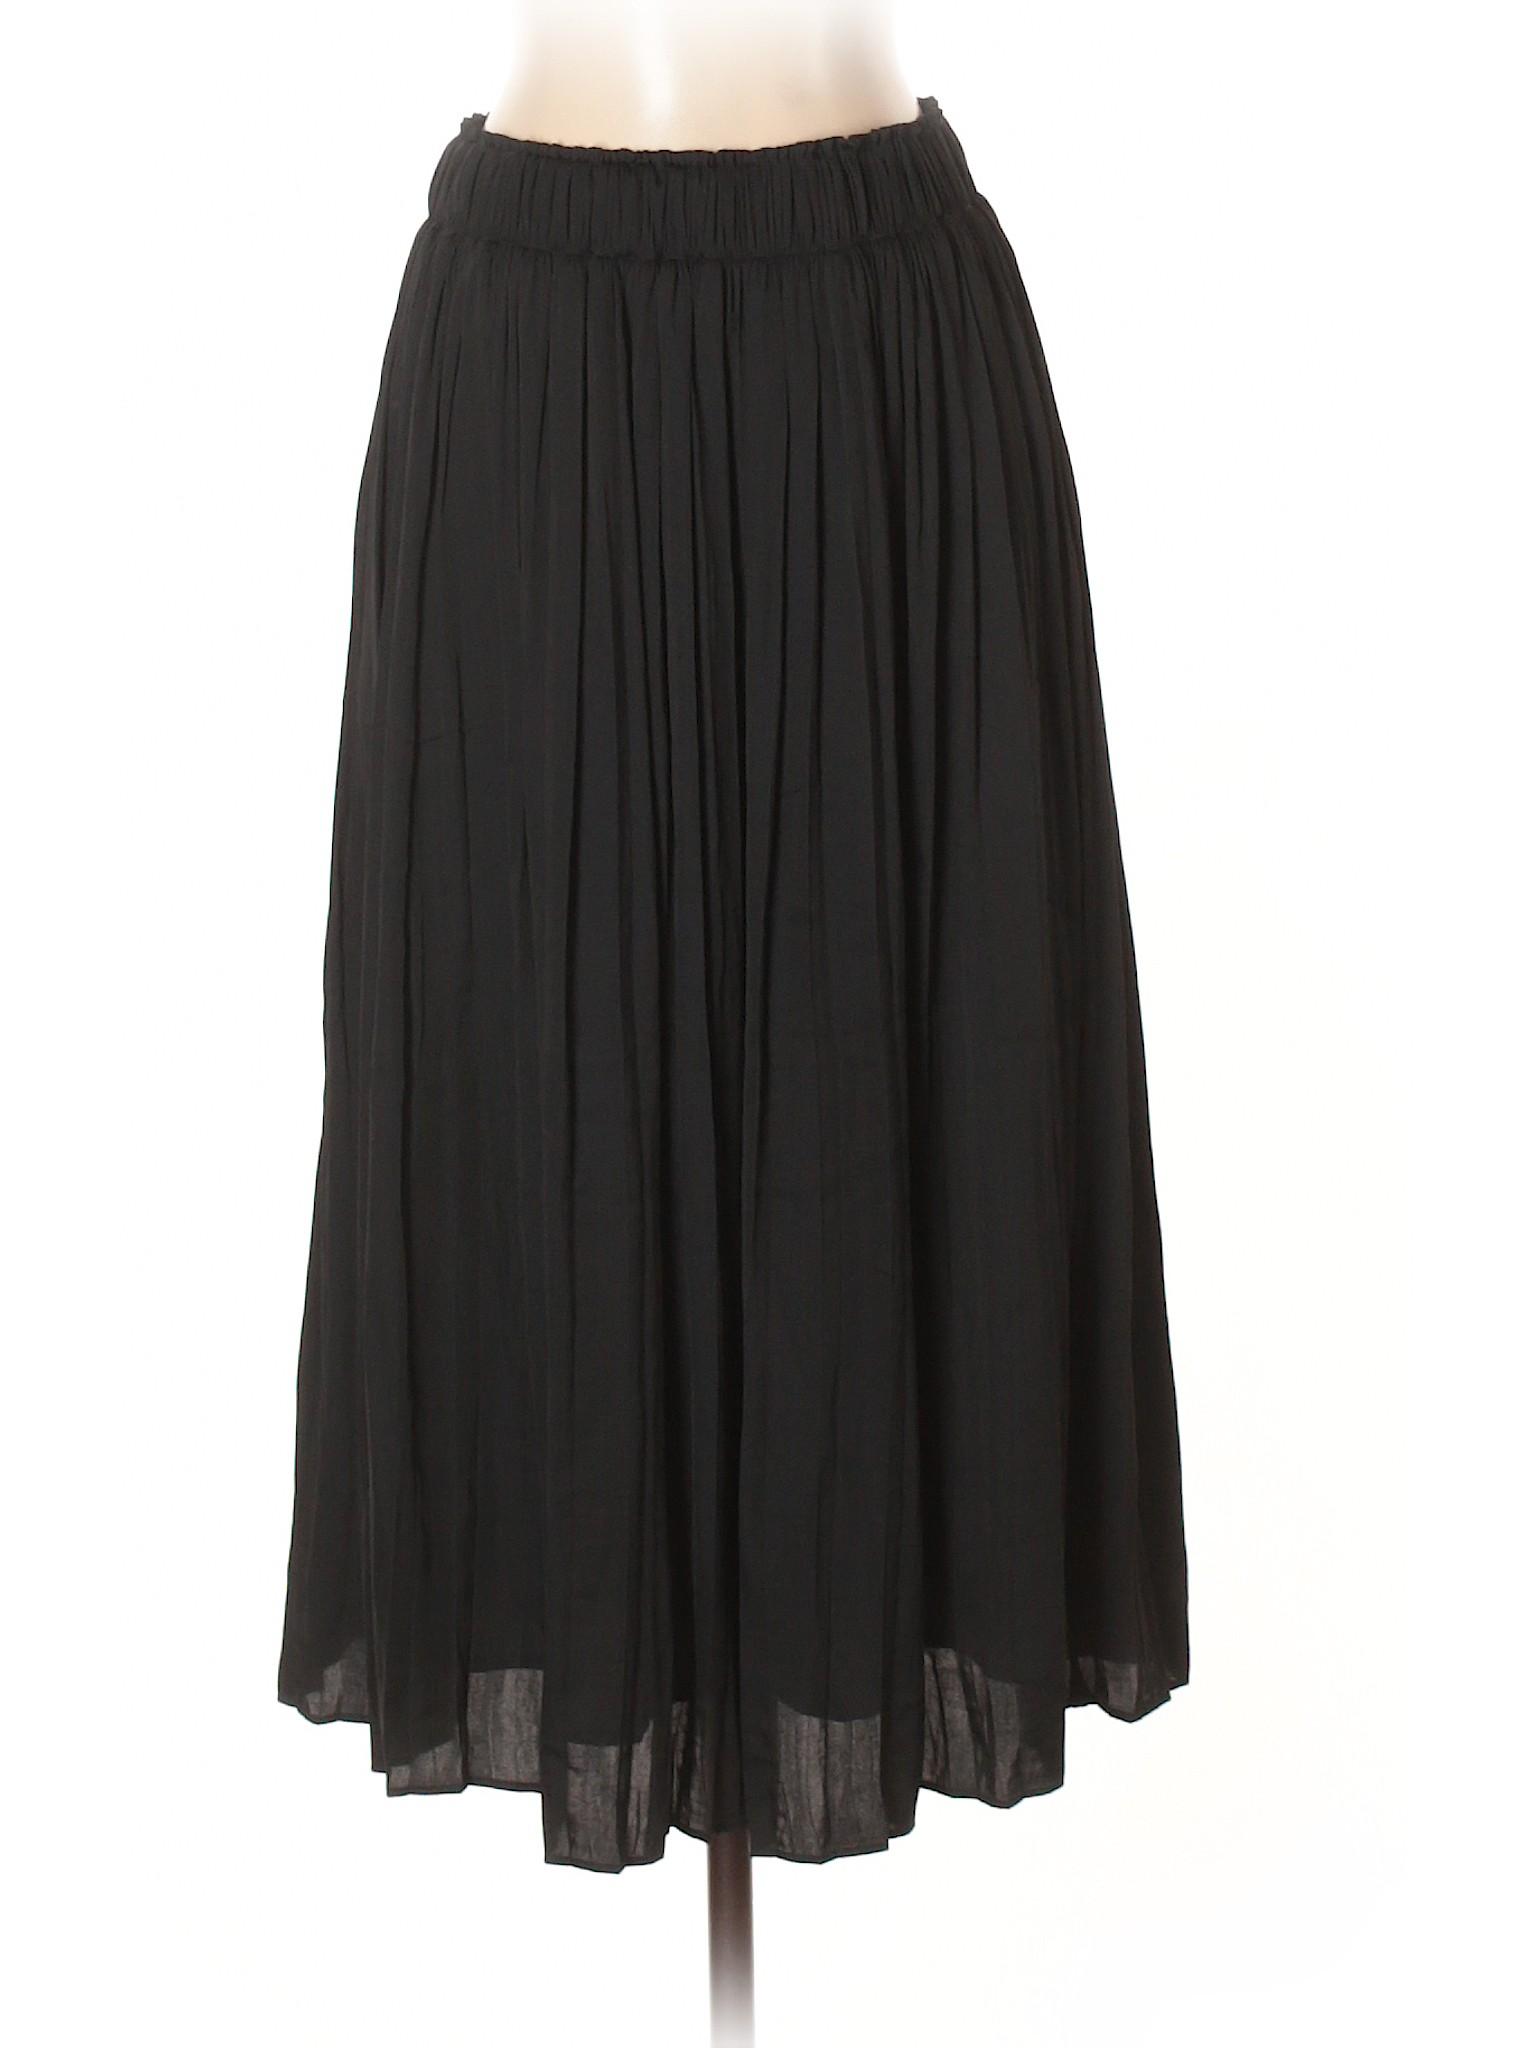 Boutique Boutique Boutique Skirt Skirt Casual Casual SgptxwH0gq